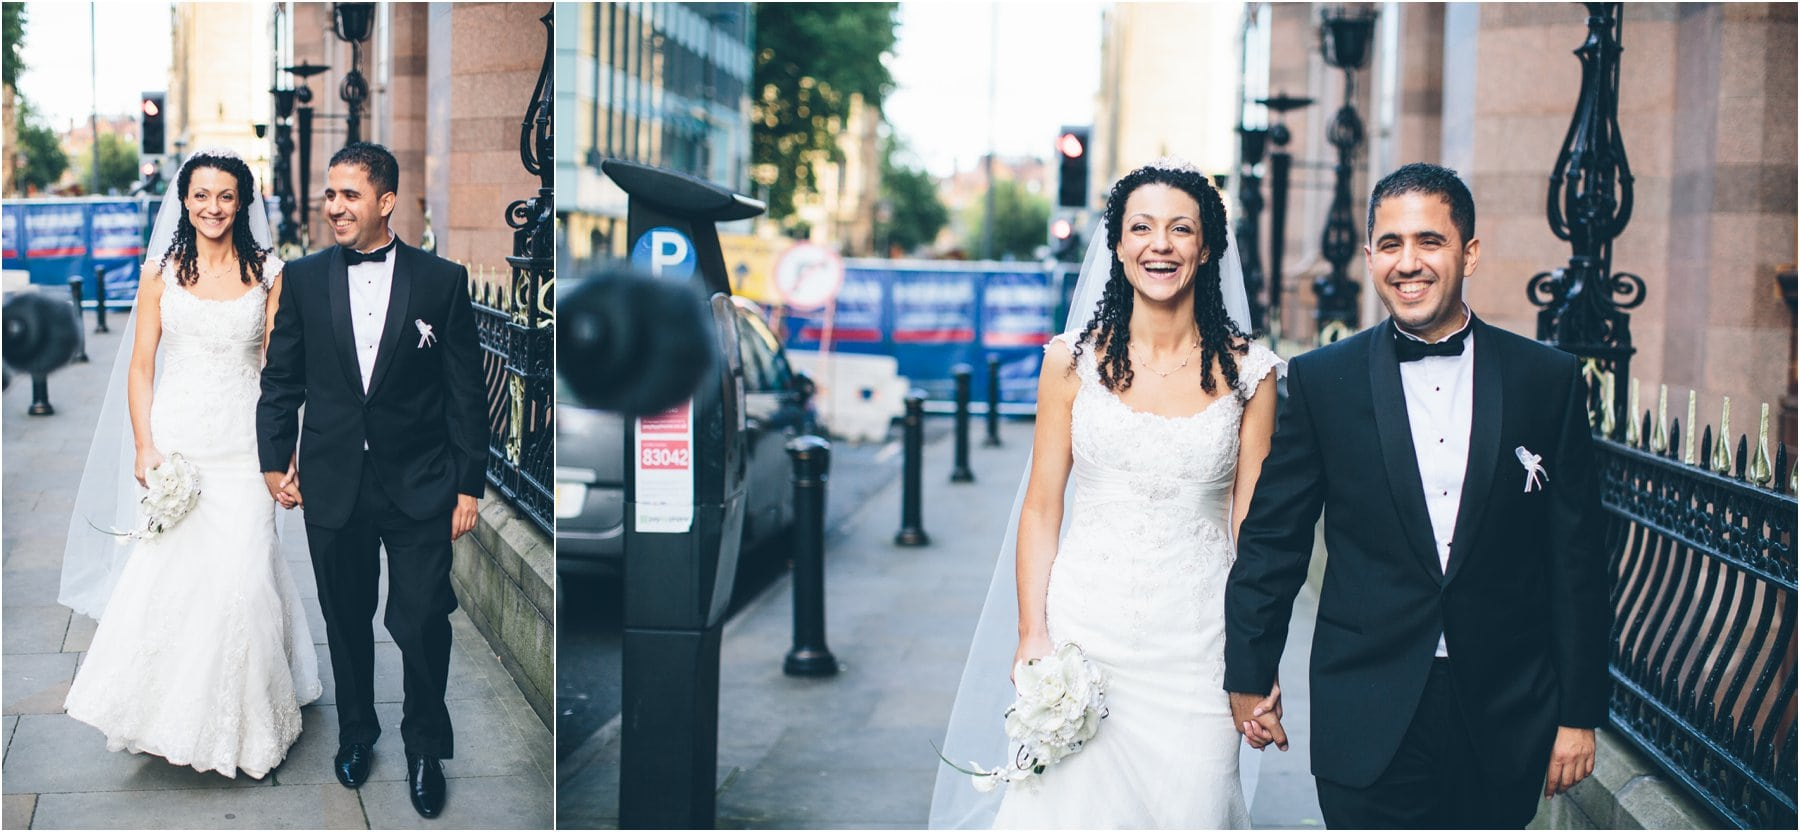 Midland_Manchester_Wedding_Photography_0083